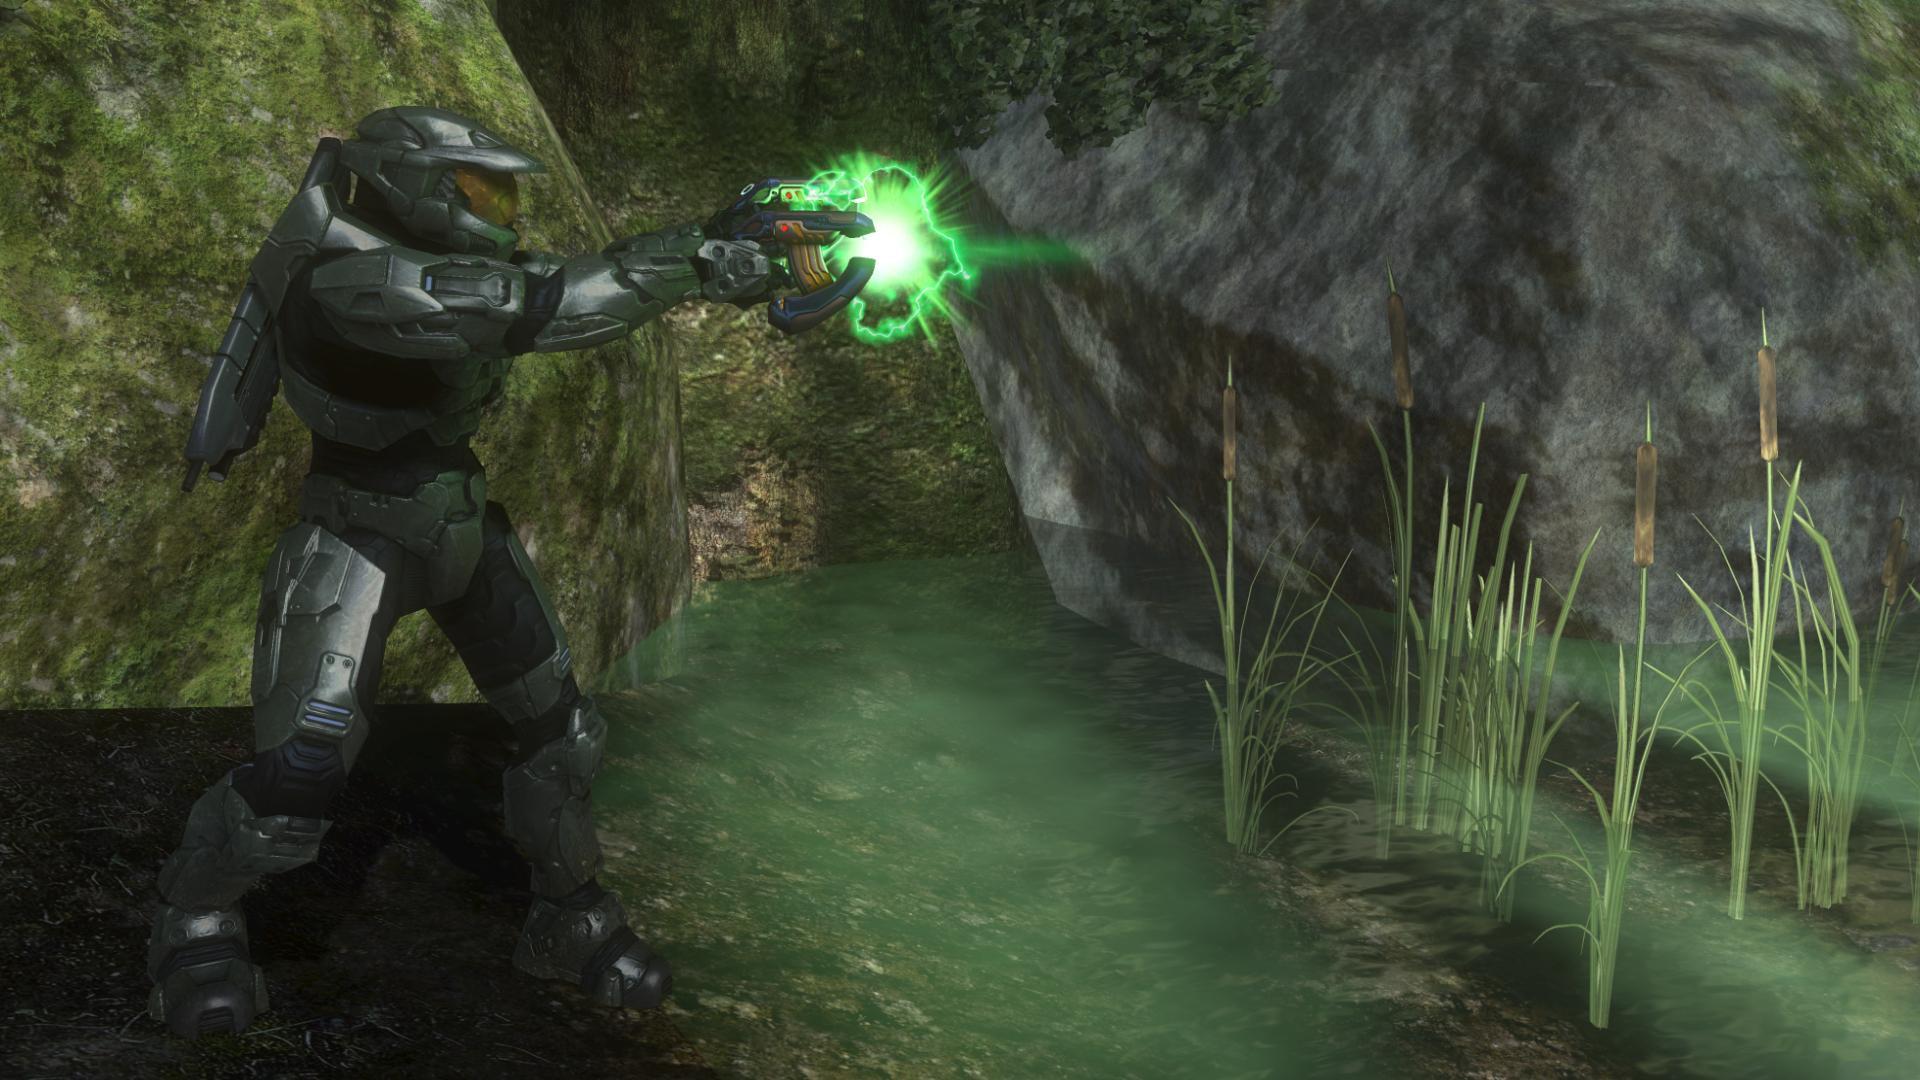 1521477546 62962ecb28 o Halo 3: Swamp